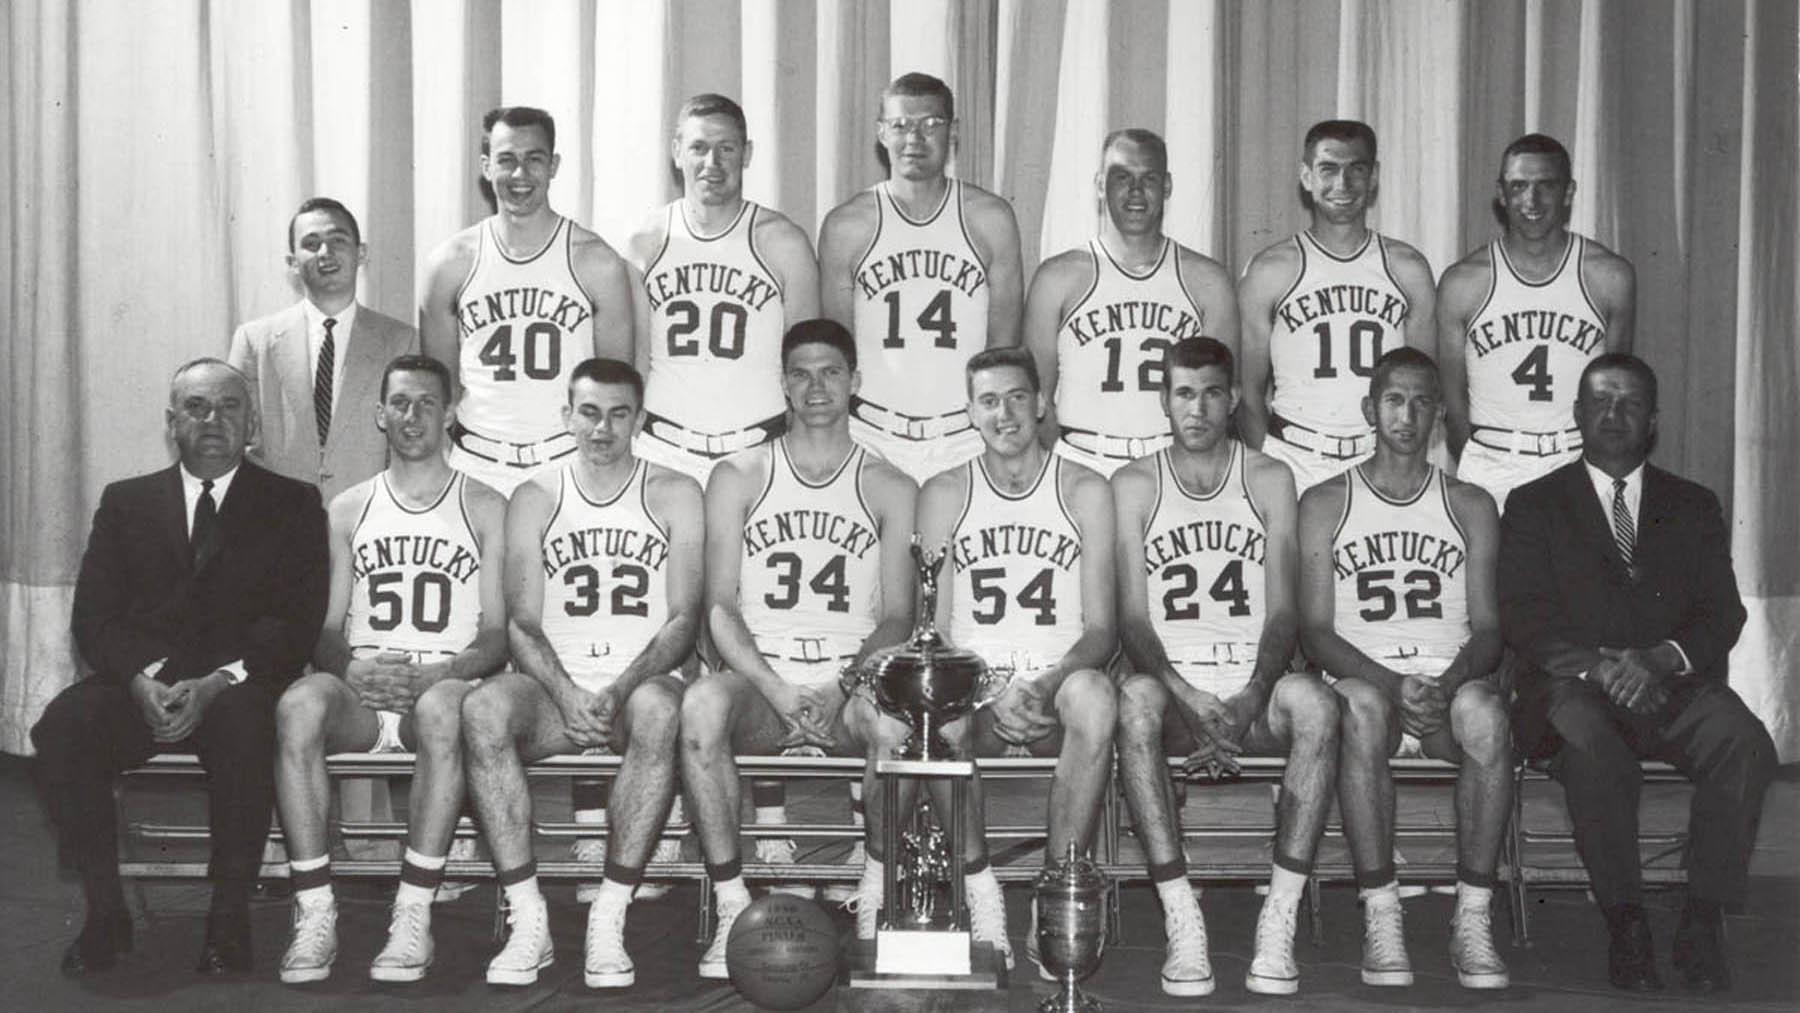 1958 Kentucky basketball